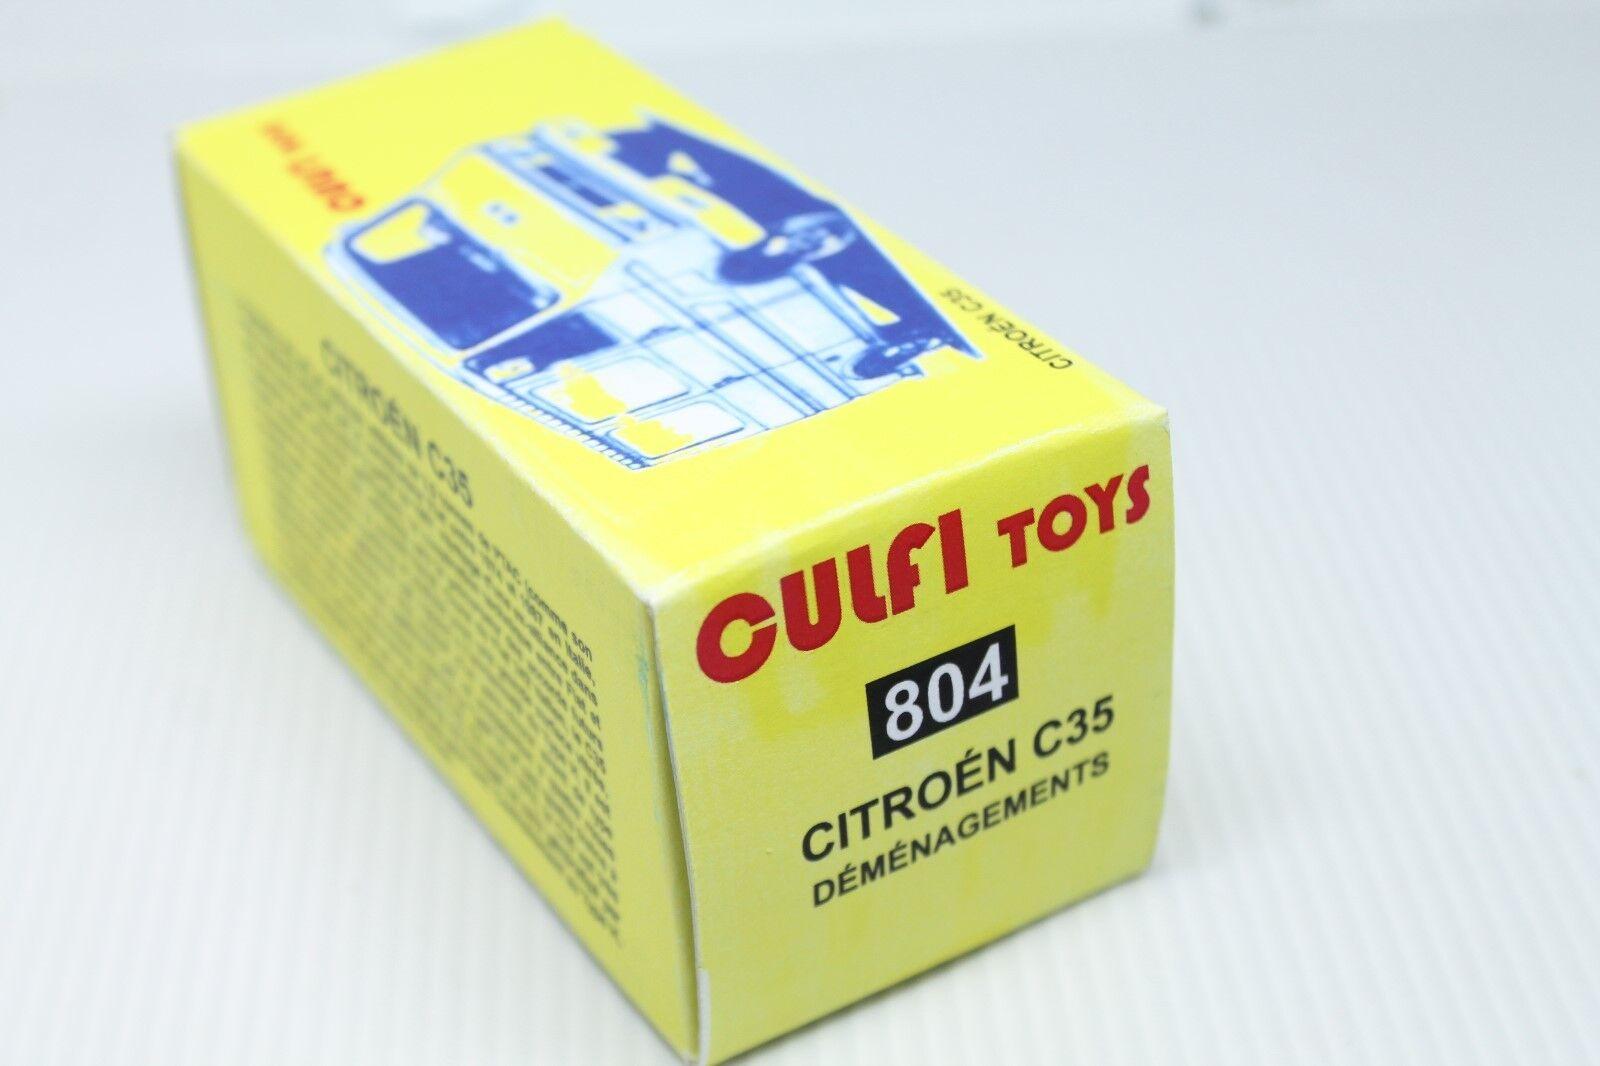 Culfi Toys Toys Toys  citroen c35  demenagements  1 43 8f8f2c